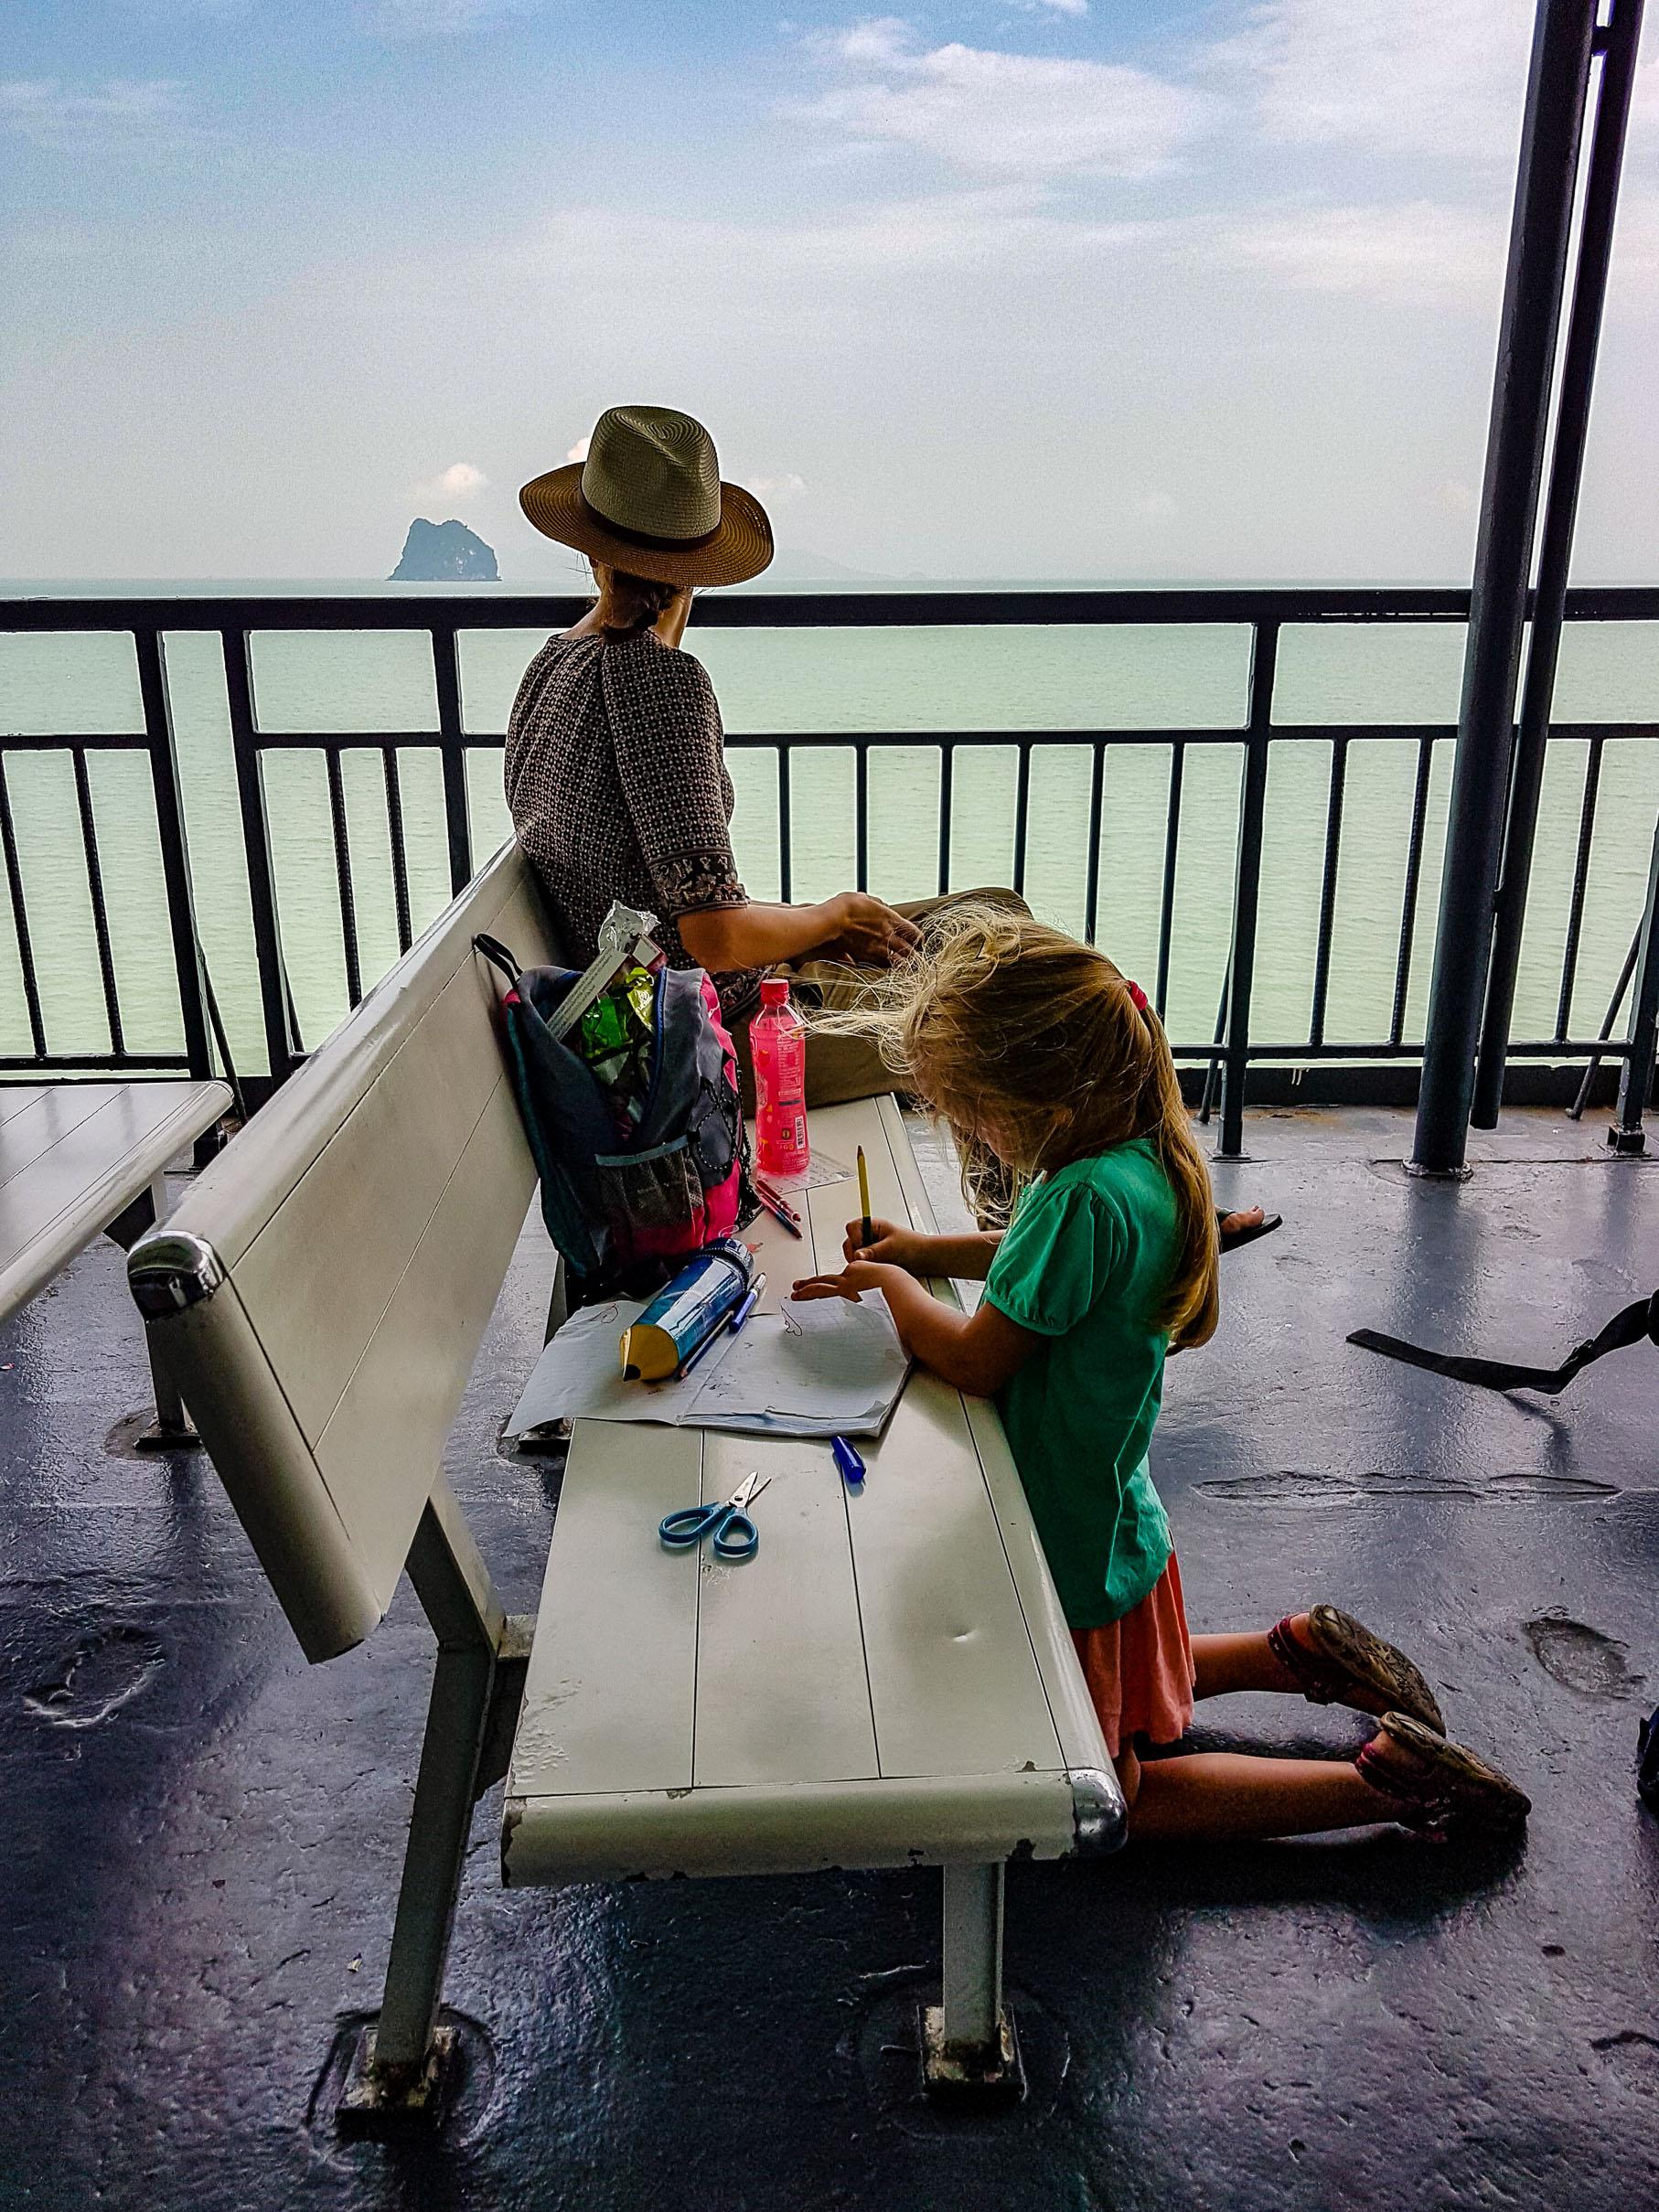 O podróżowaniu promem na wyspę Koh Samui. [O podróżowaniu] Koh Samui, Tajlandia.